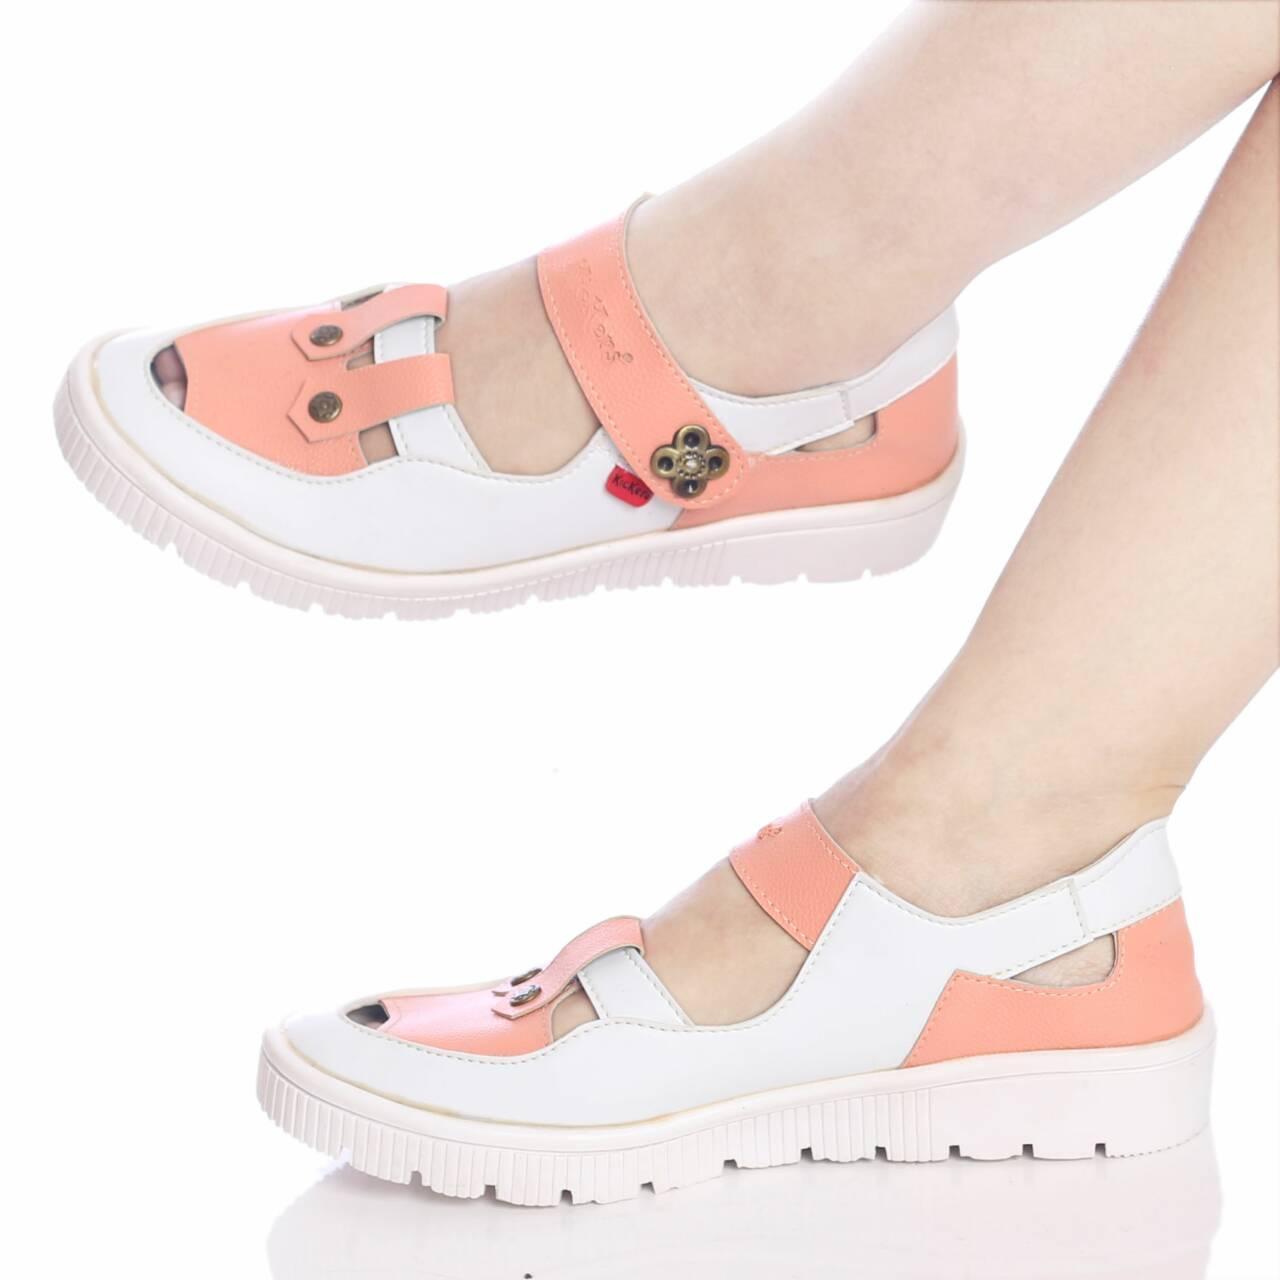 Promo sepatu sandal murah wanita cewek platform KICKERS france Fashion